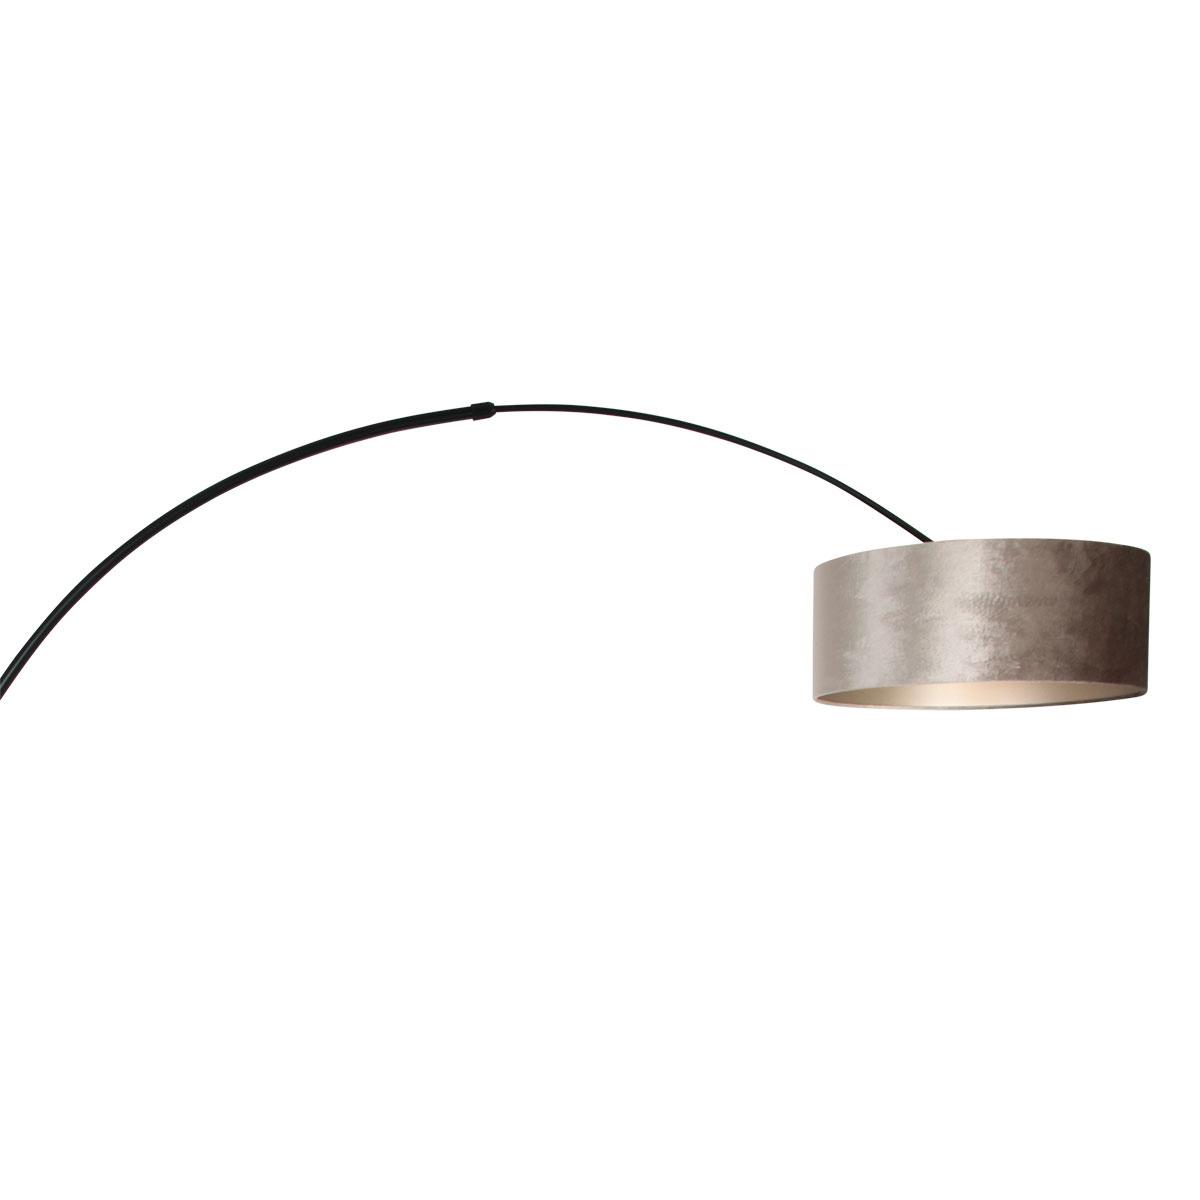 Steinhauer Vloerlamp Sparkled light 8128 zwart kap zilveren velours